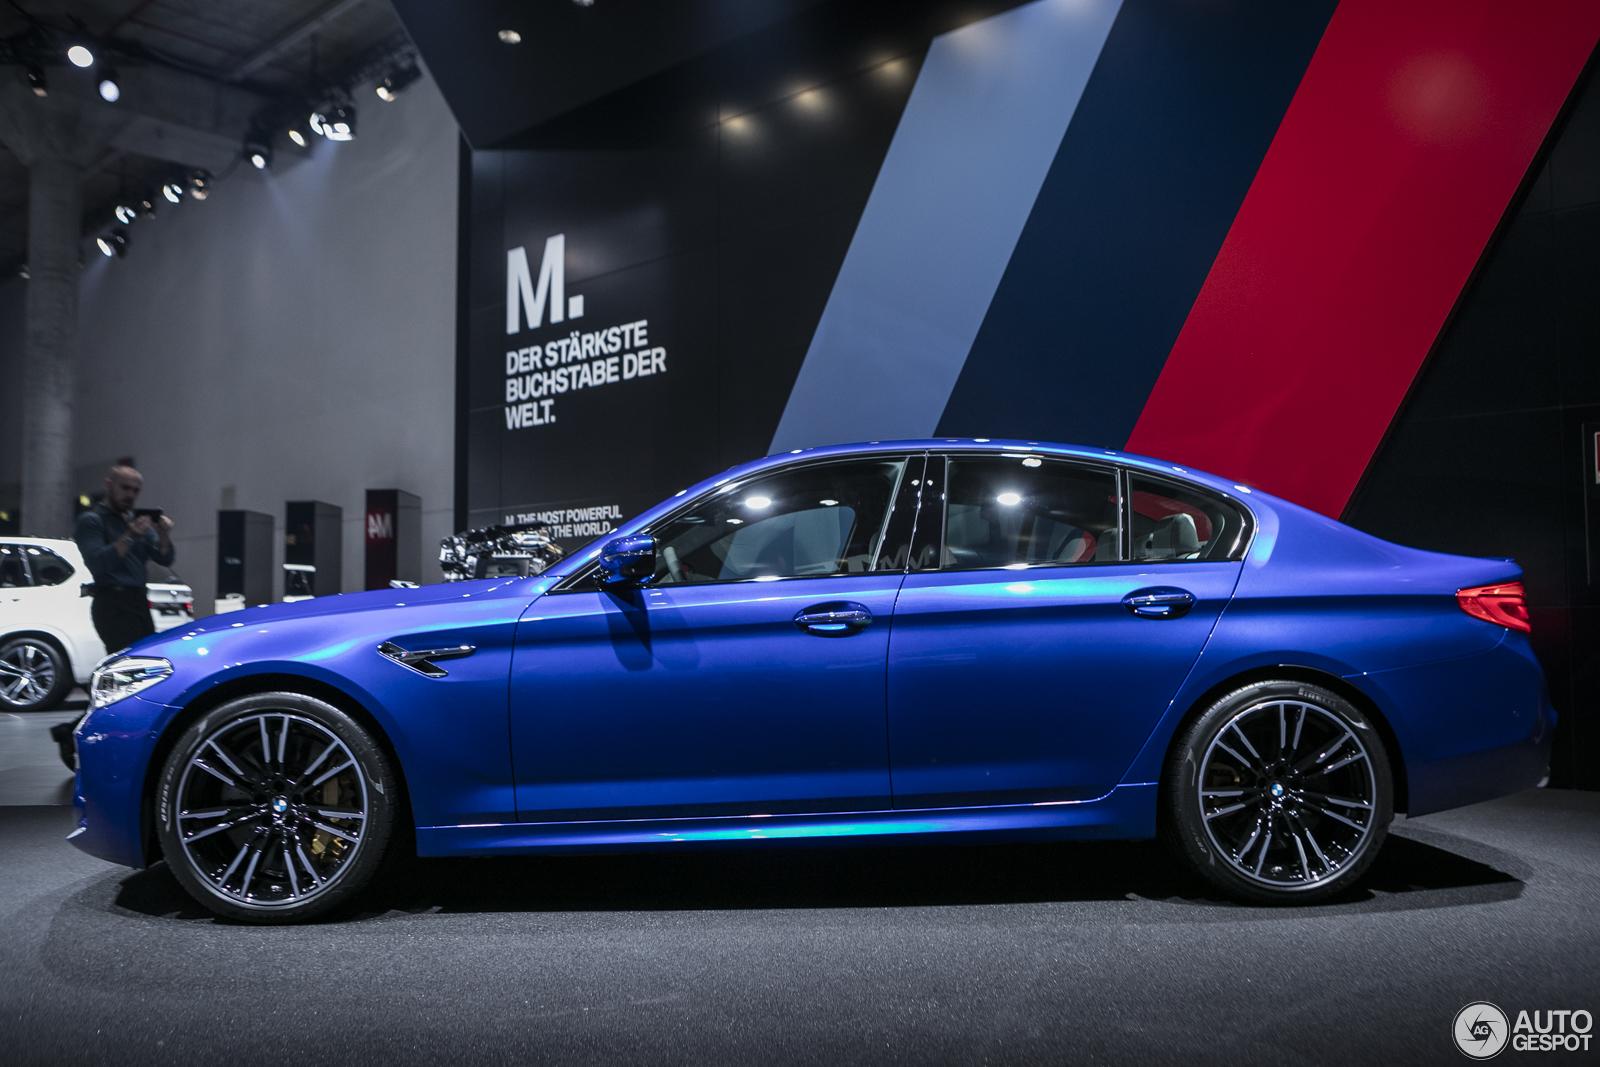 Bmw M5 G30 >> IAA 2017: BMW M5 G30